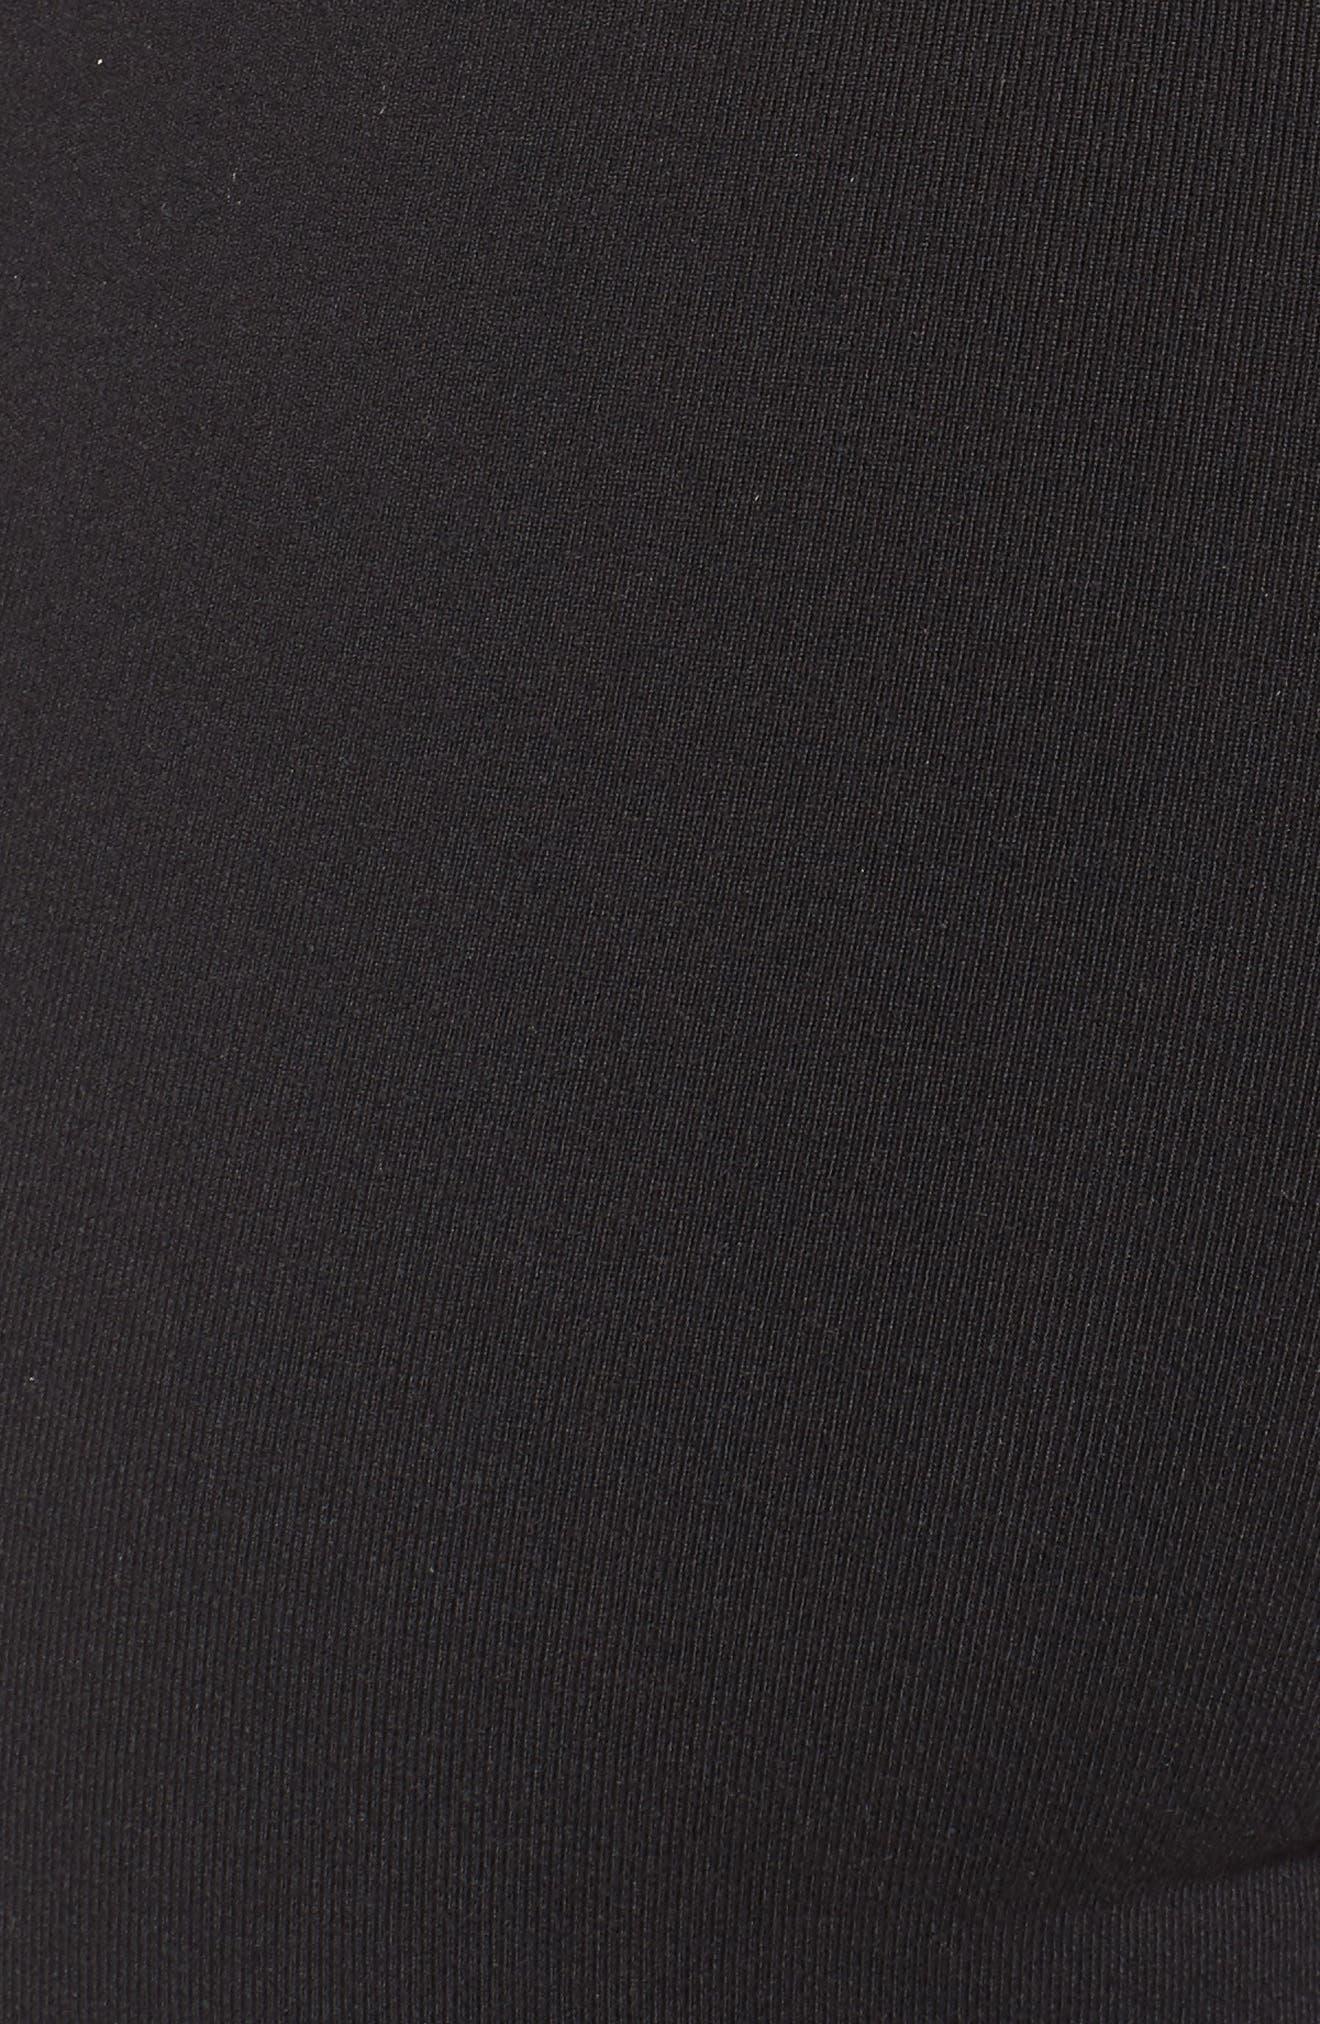 Luminous Leggings,                             Alternate thumbnail 6, color,                             001